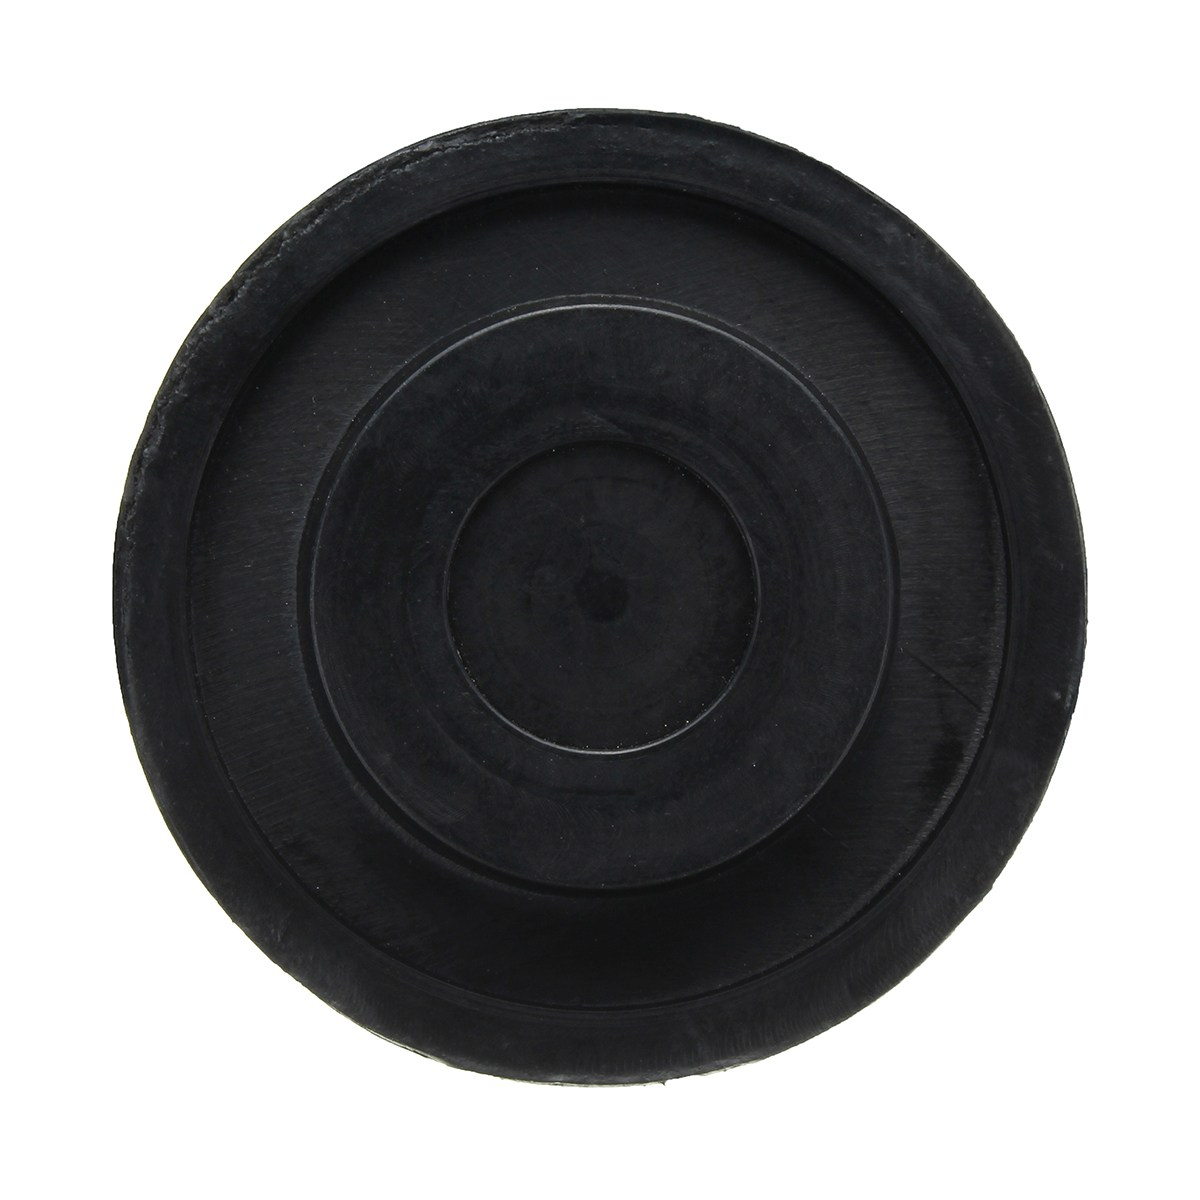 2pcs Car Anti-Slip Slotted Frame Rail Floor Jack Disk Rubber Pad for Pinch Weld Side Jack Pad